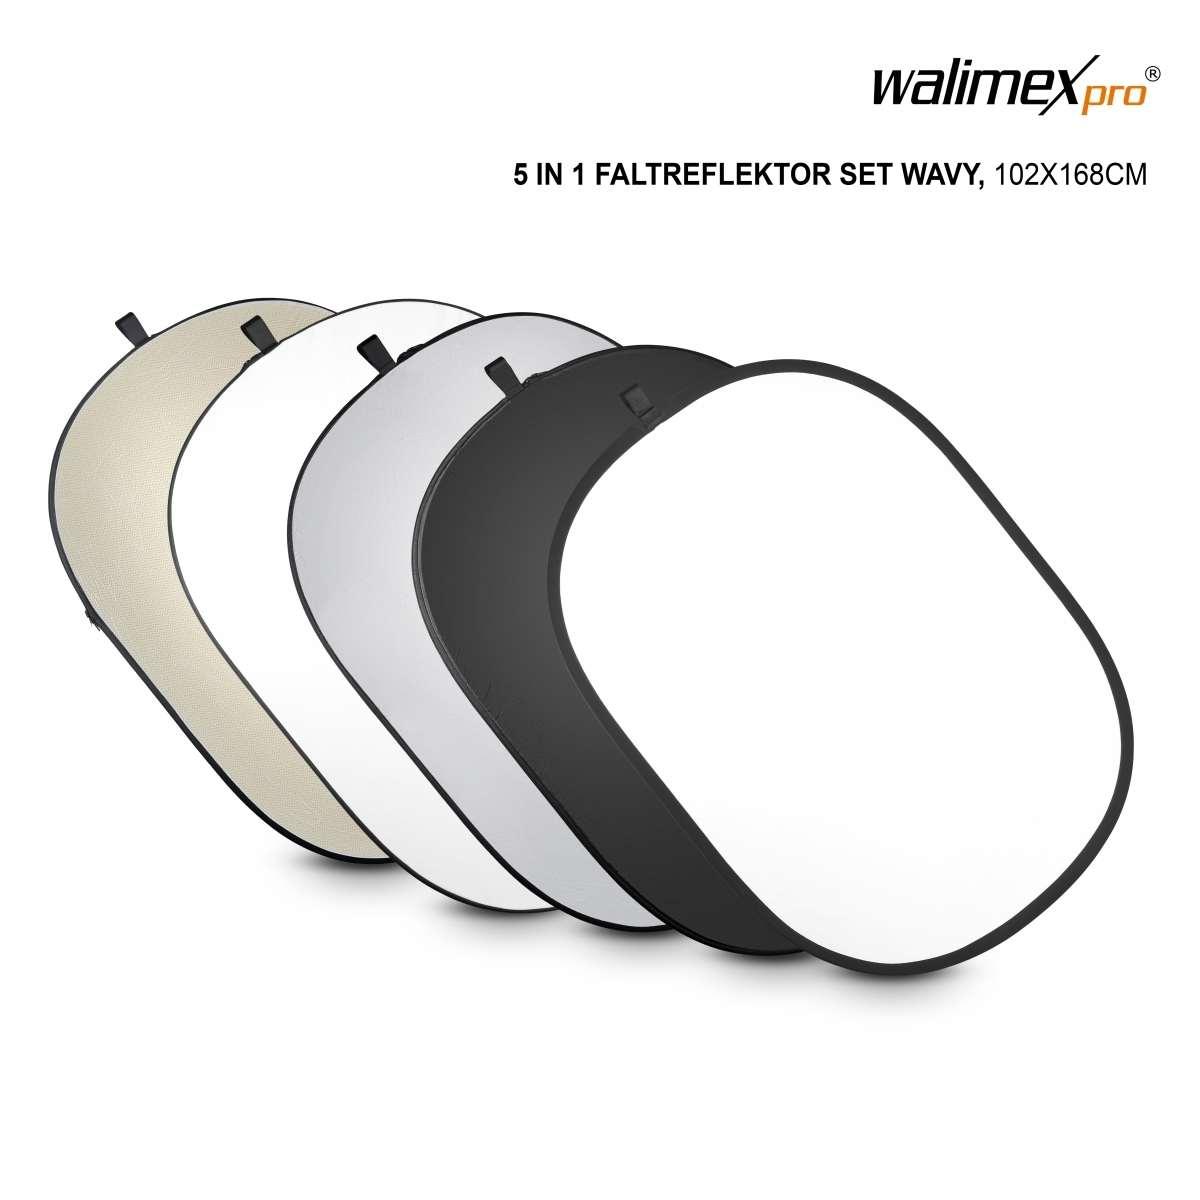 Walimex pro 5in1 Foldable Reflector Set, 102x168cm